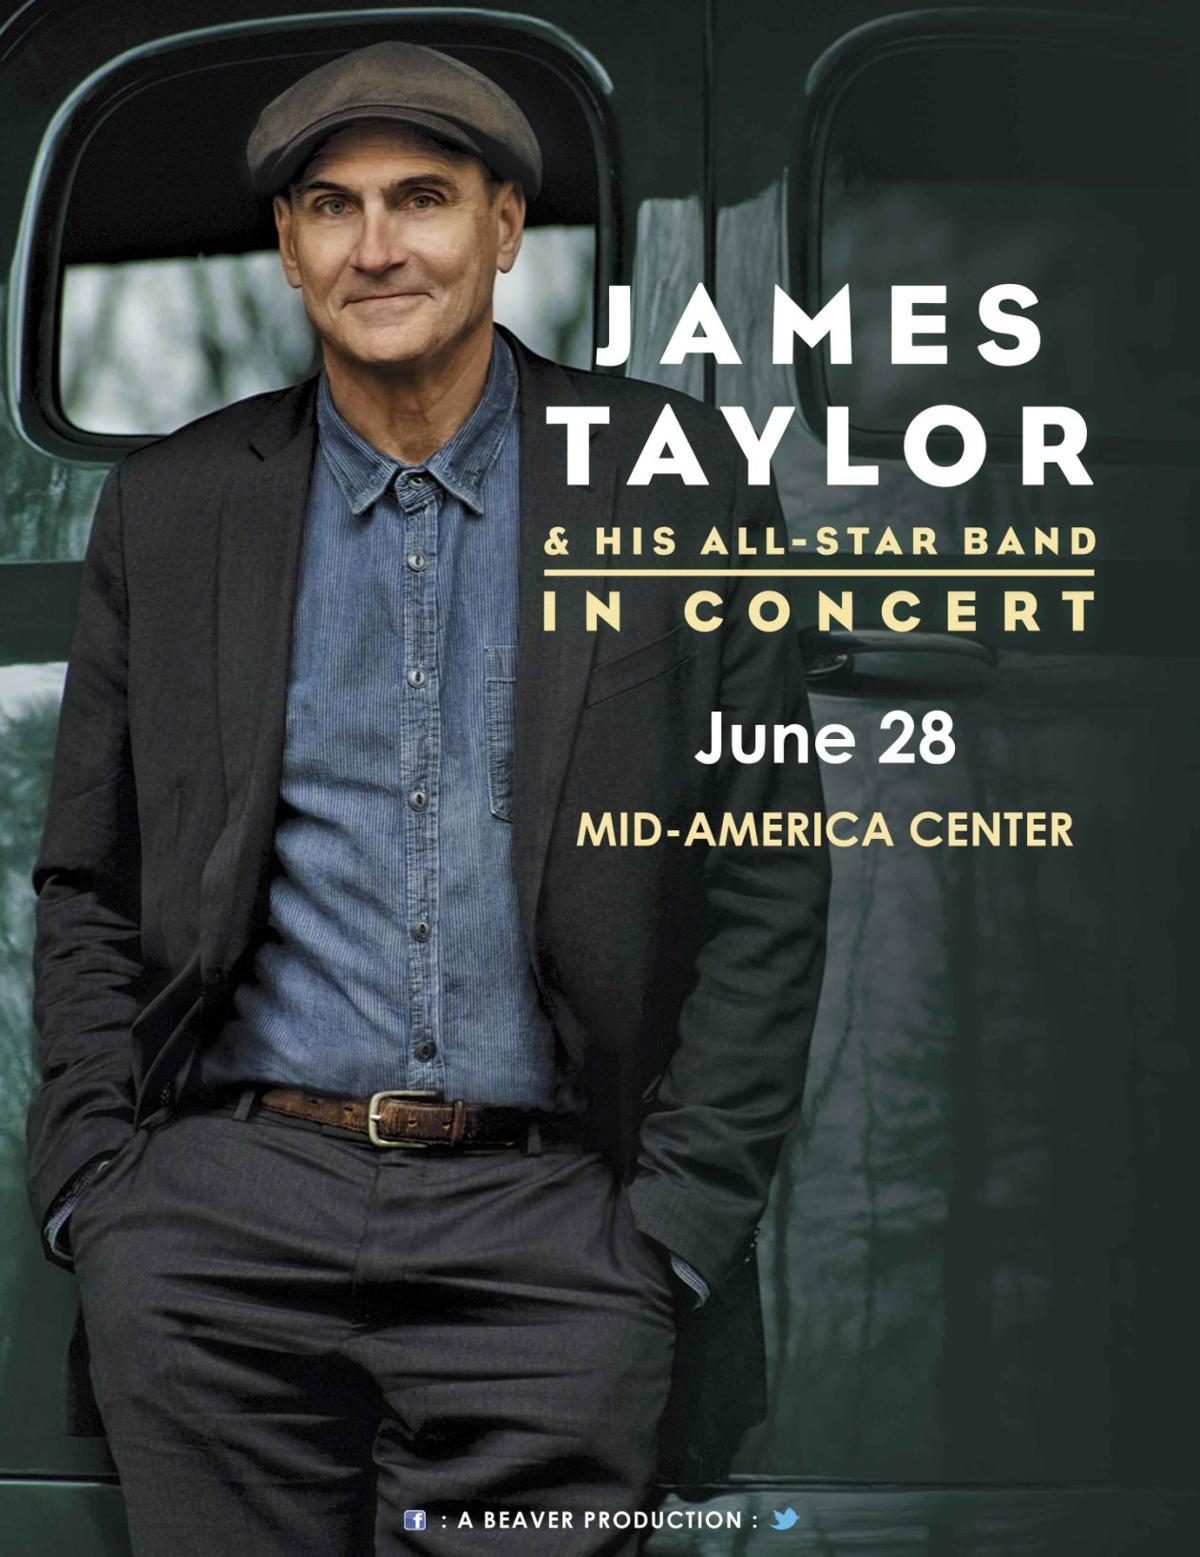 James Taylor ad